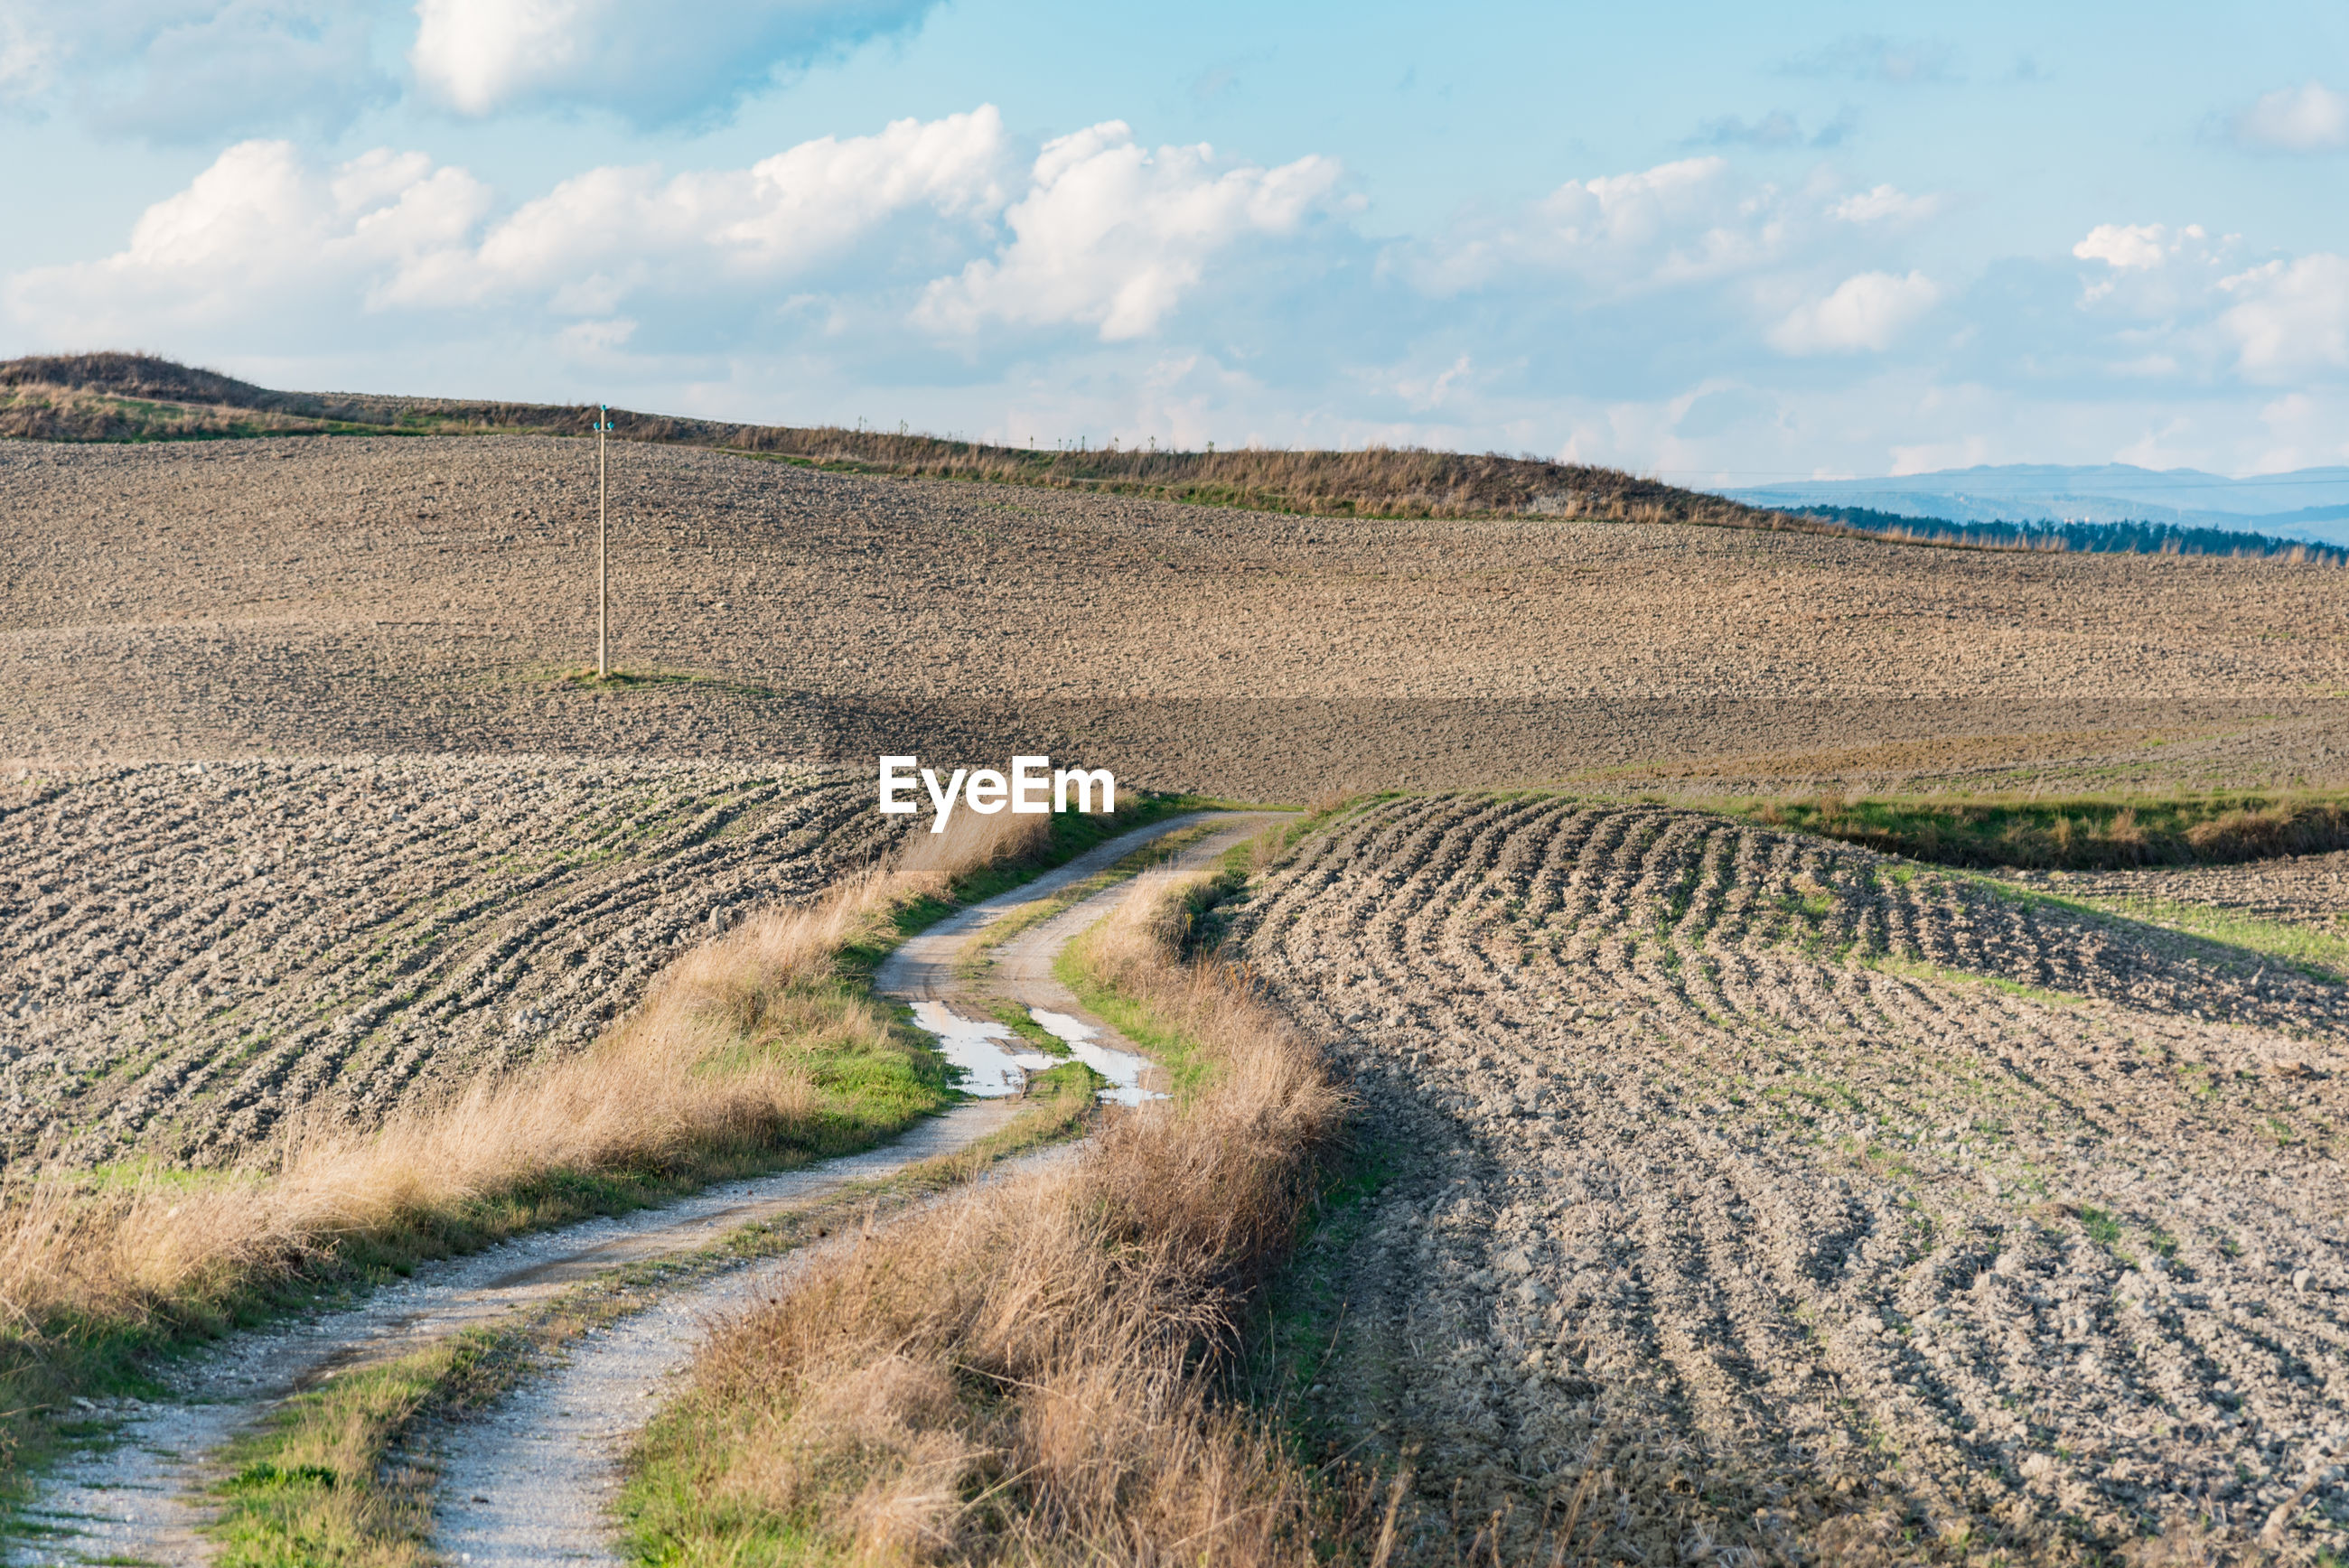 VIEW OF DIRT ROAD ALONG LANDSCAPE